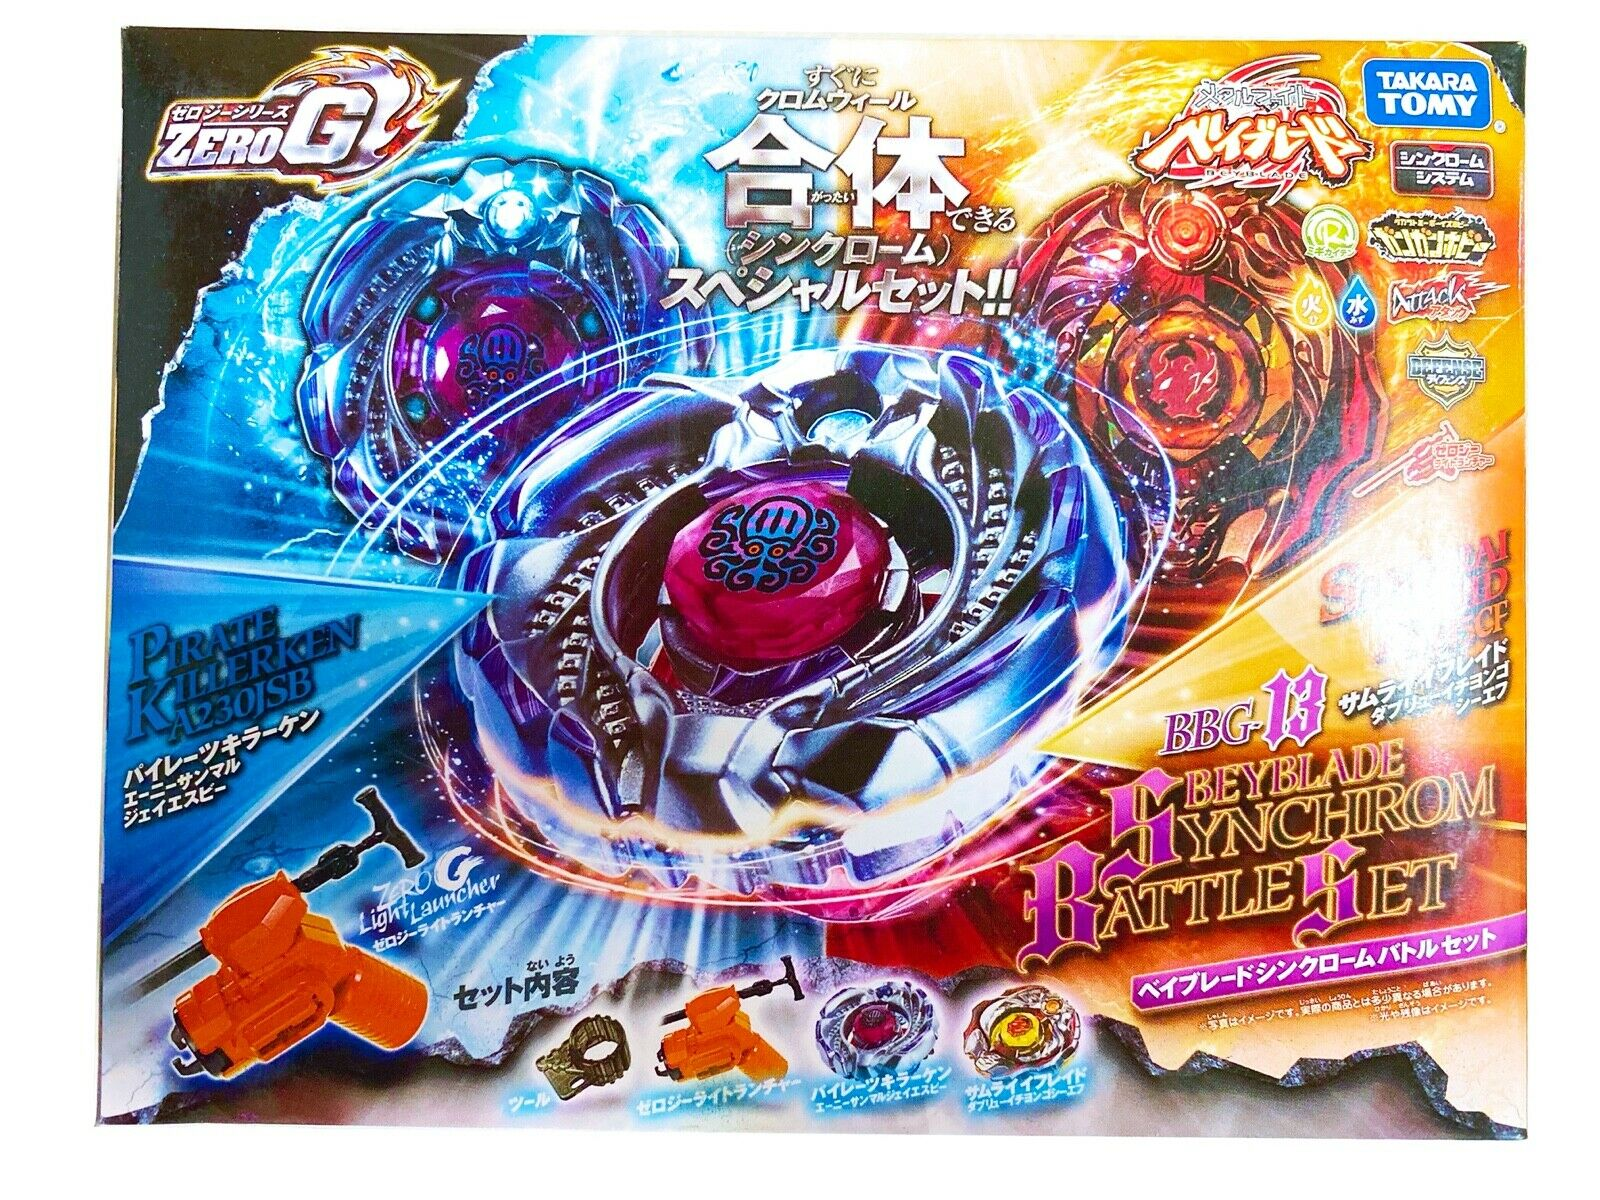 TAKARA Beyblade Zero G Synchrom Battle Set Pirate Killerken